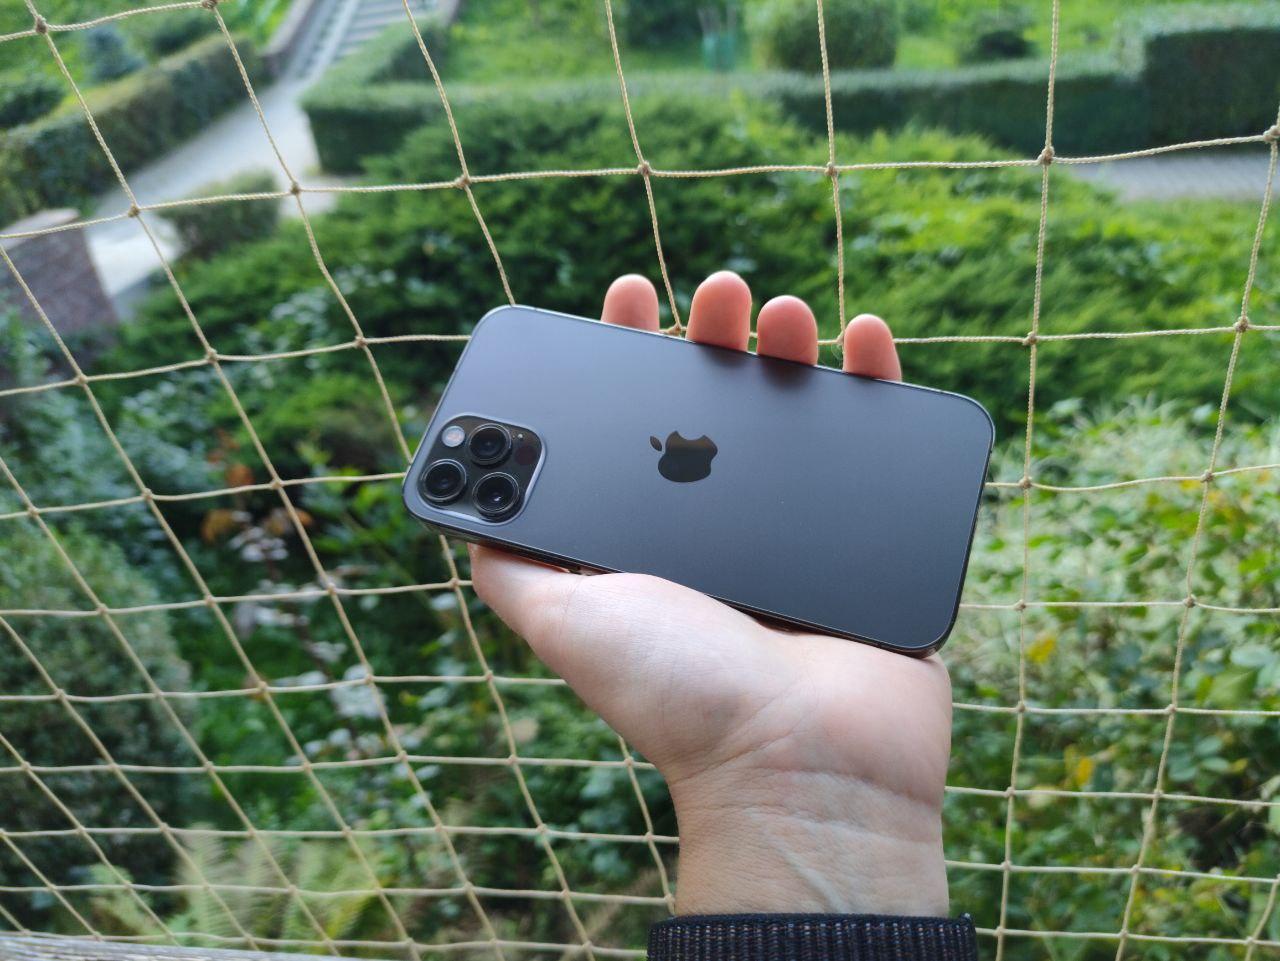 камера айфона